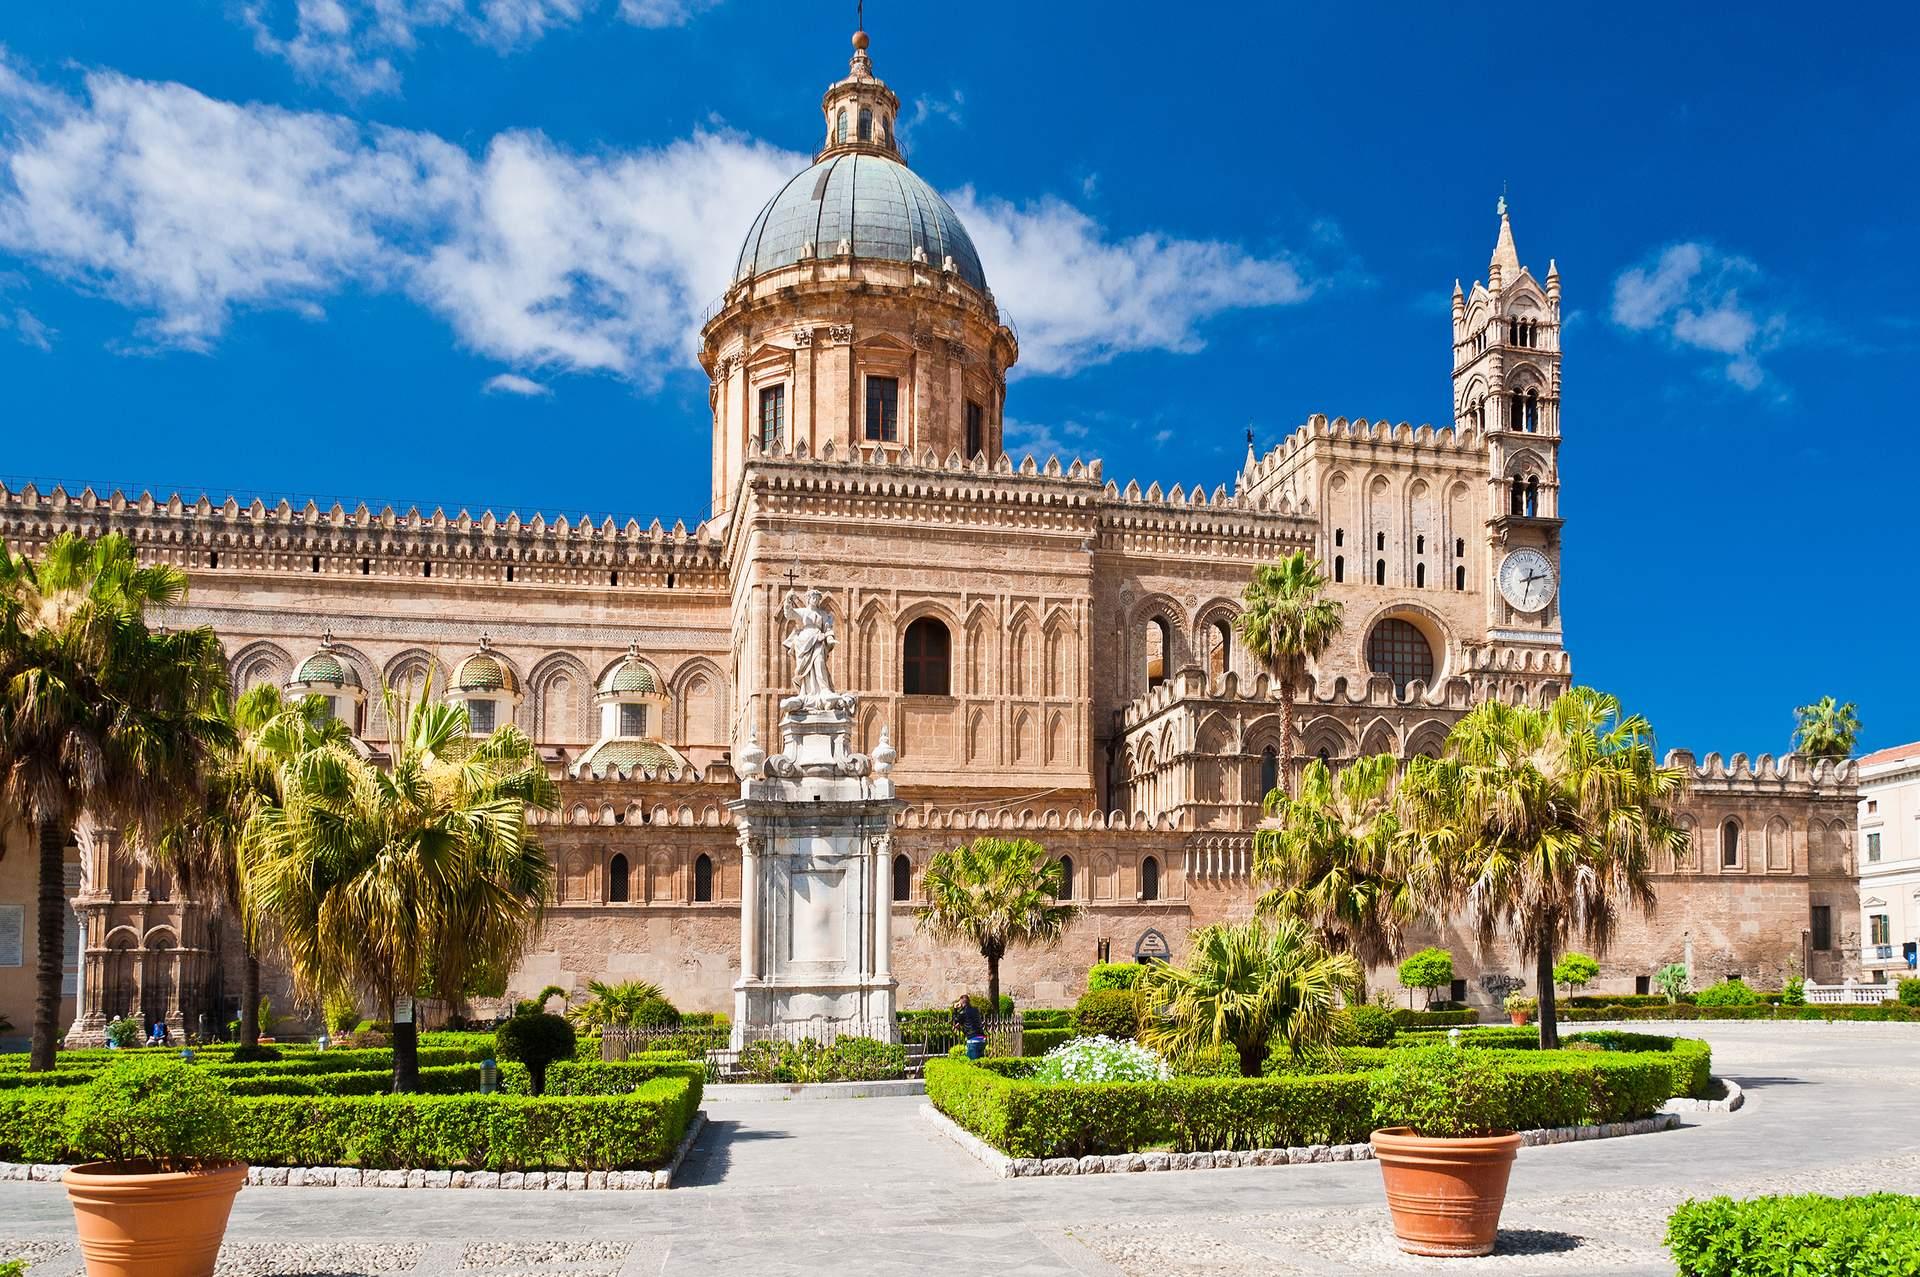 Normannendom in Palermoo